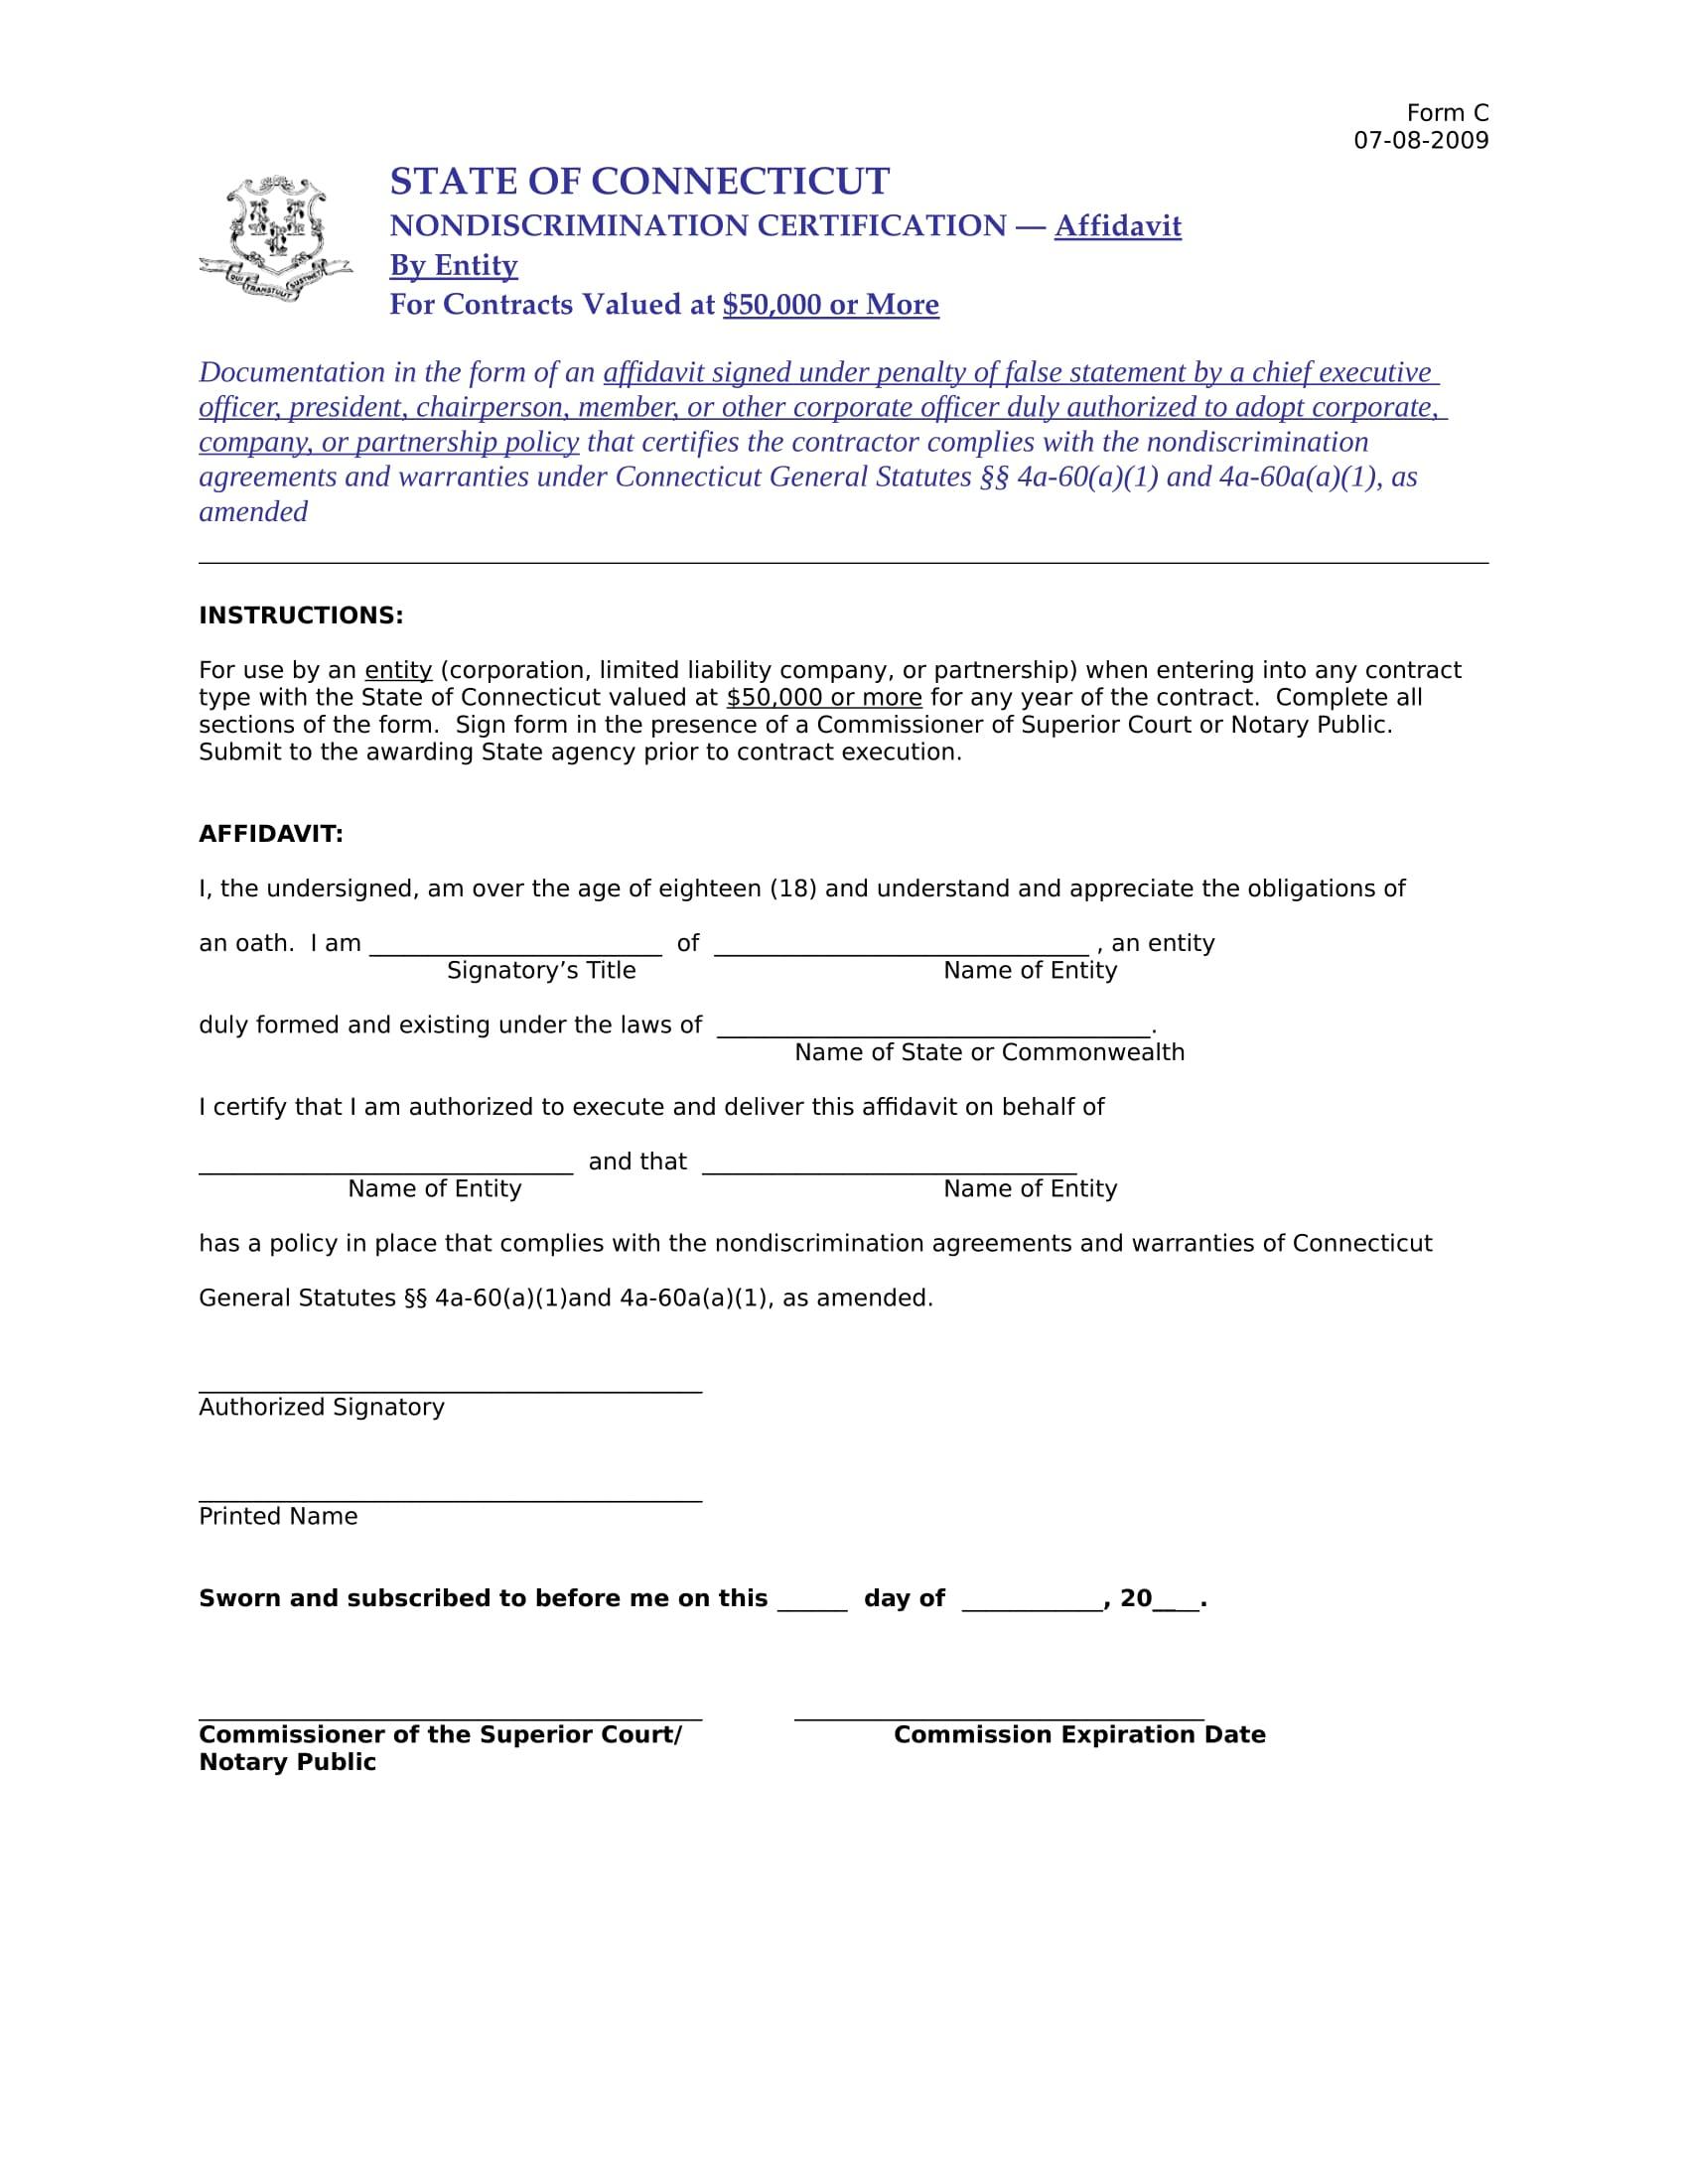 non discrimination affidavit form sample 1